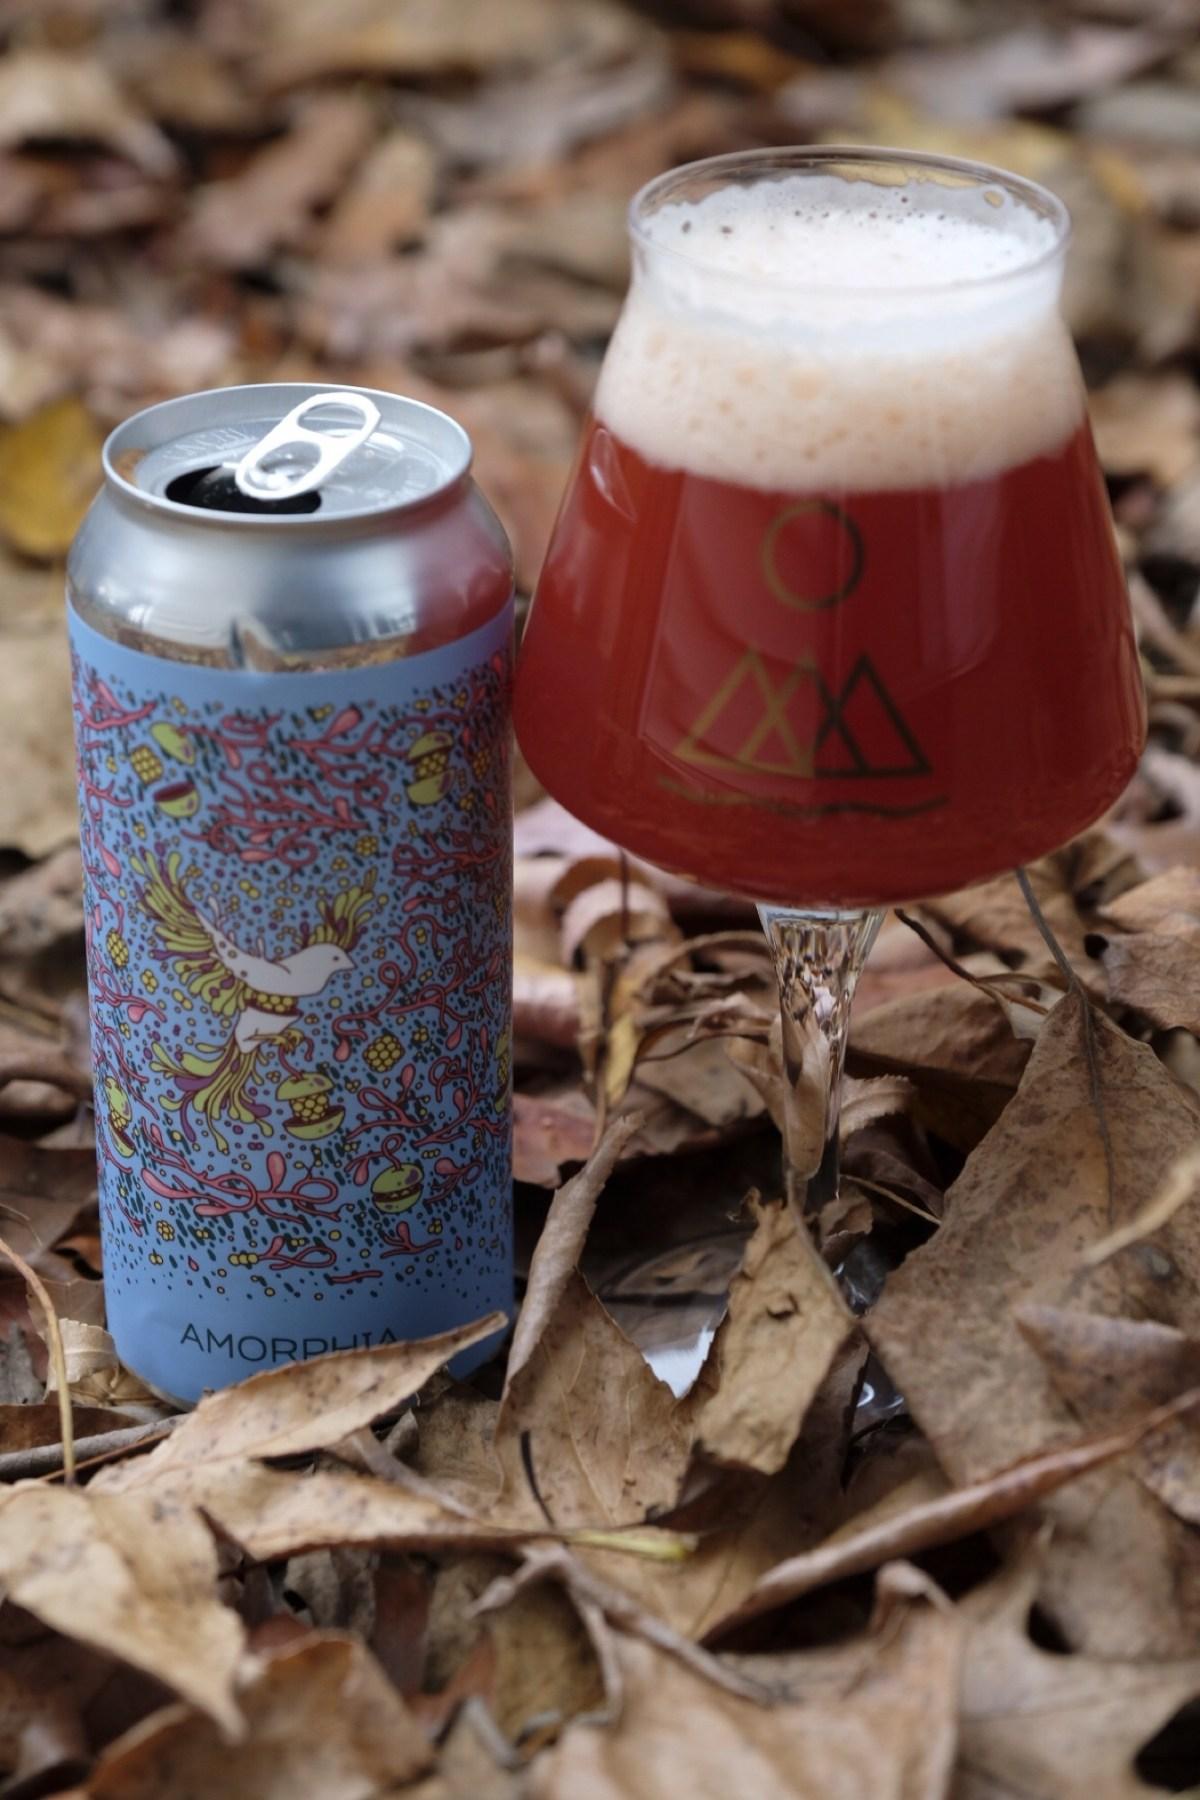 Hudson Valley Brewery Amorphia